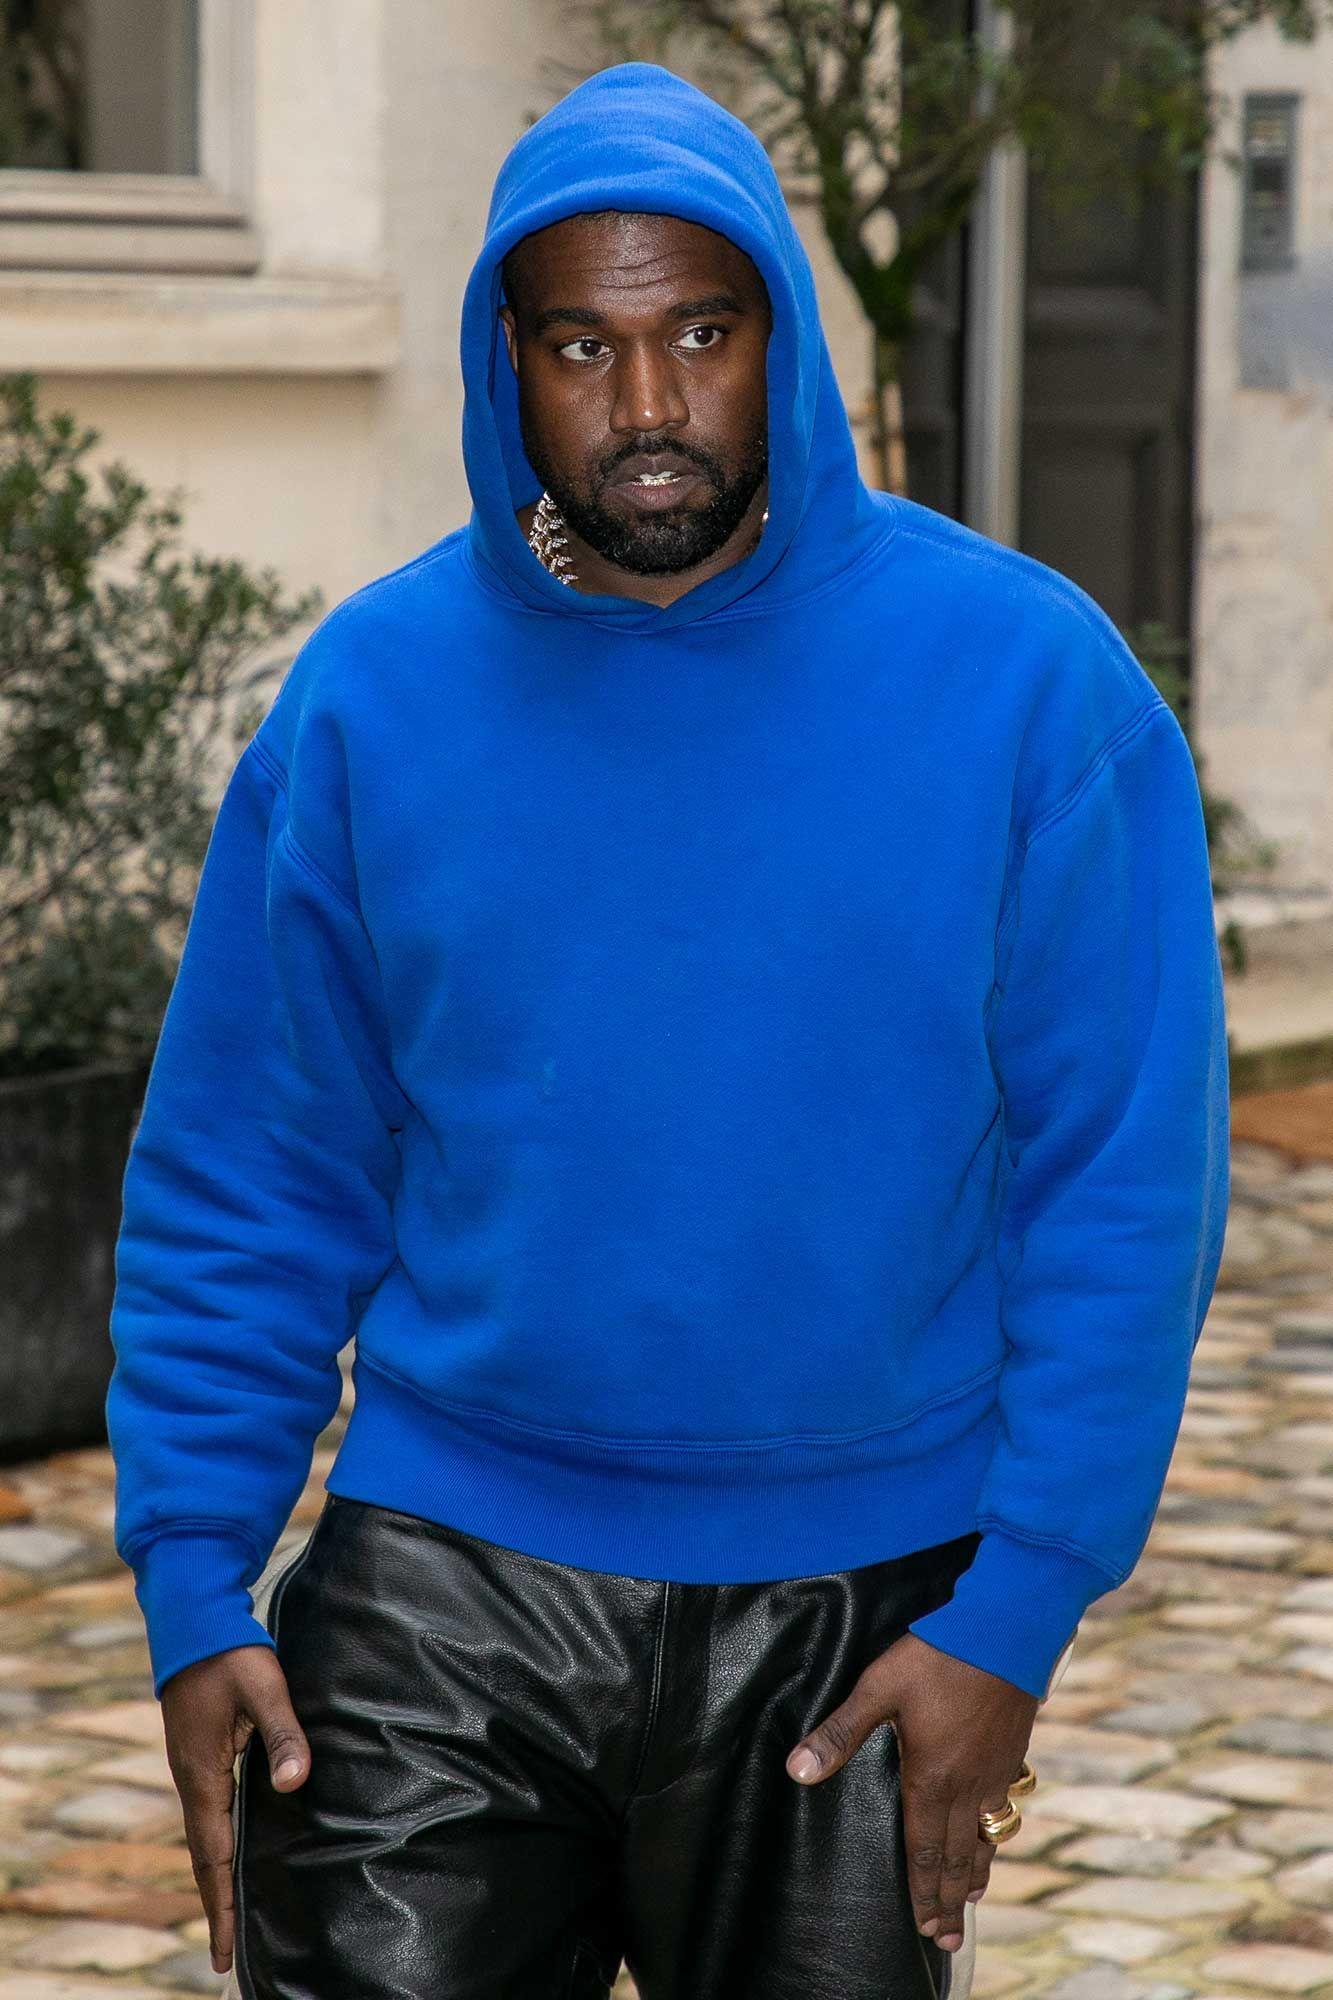 Kanye West wearing a blue hoody